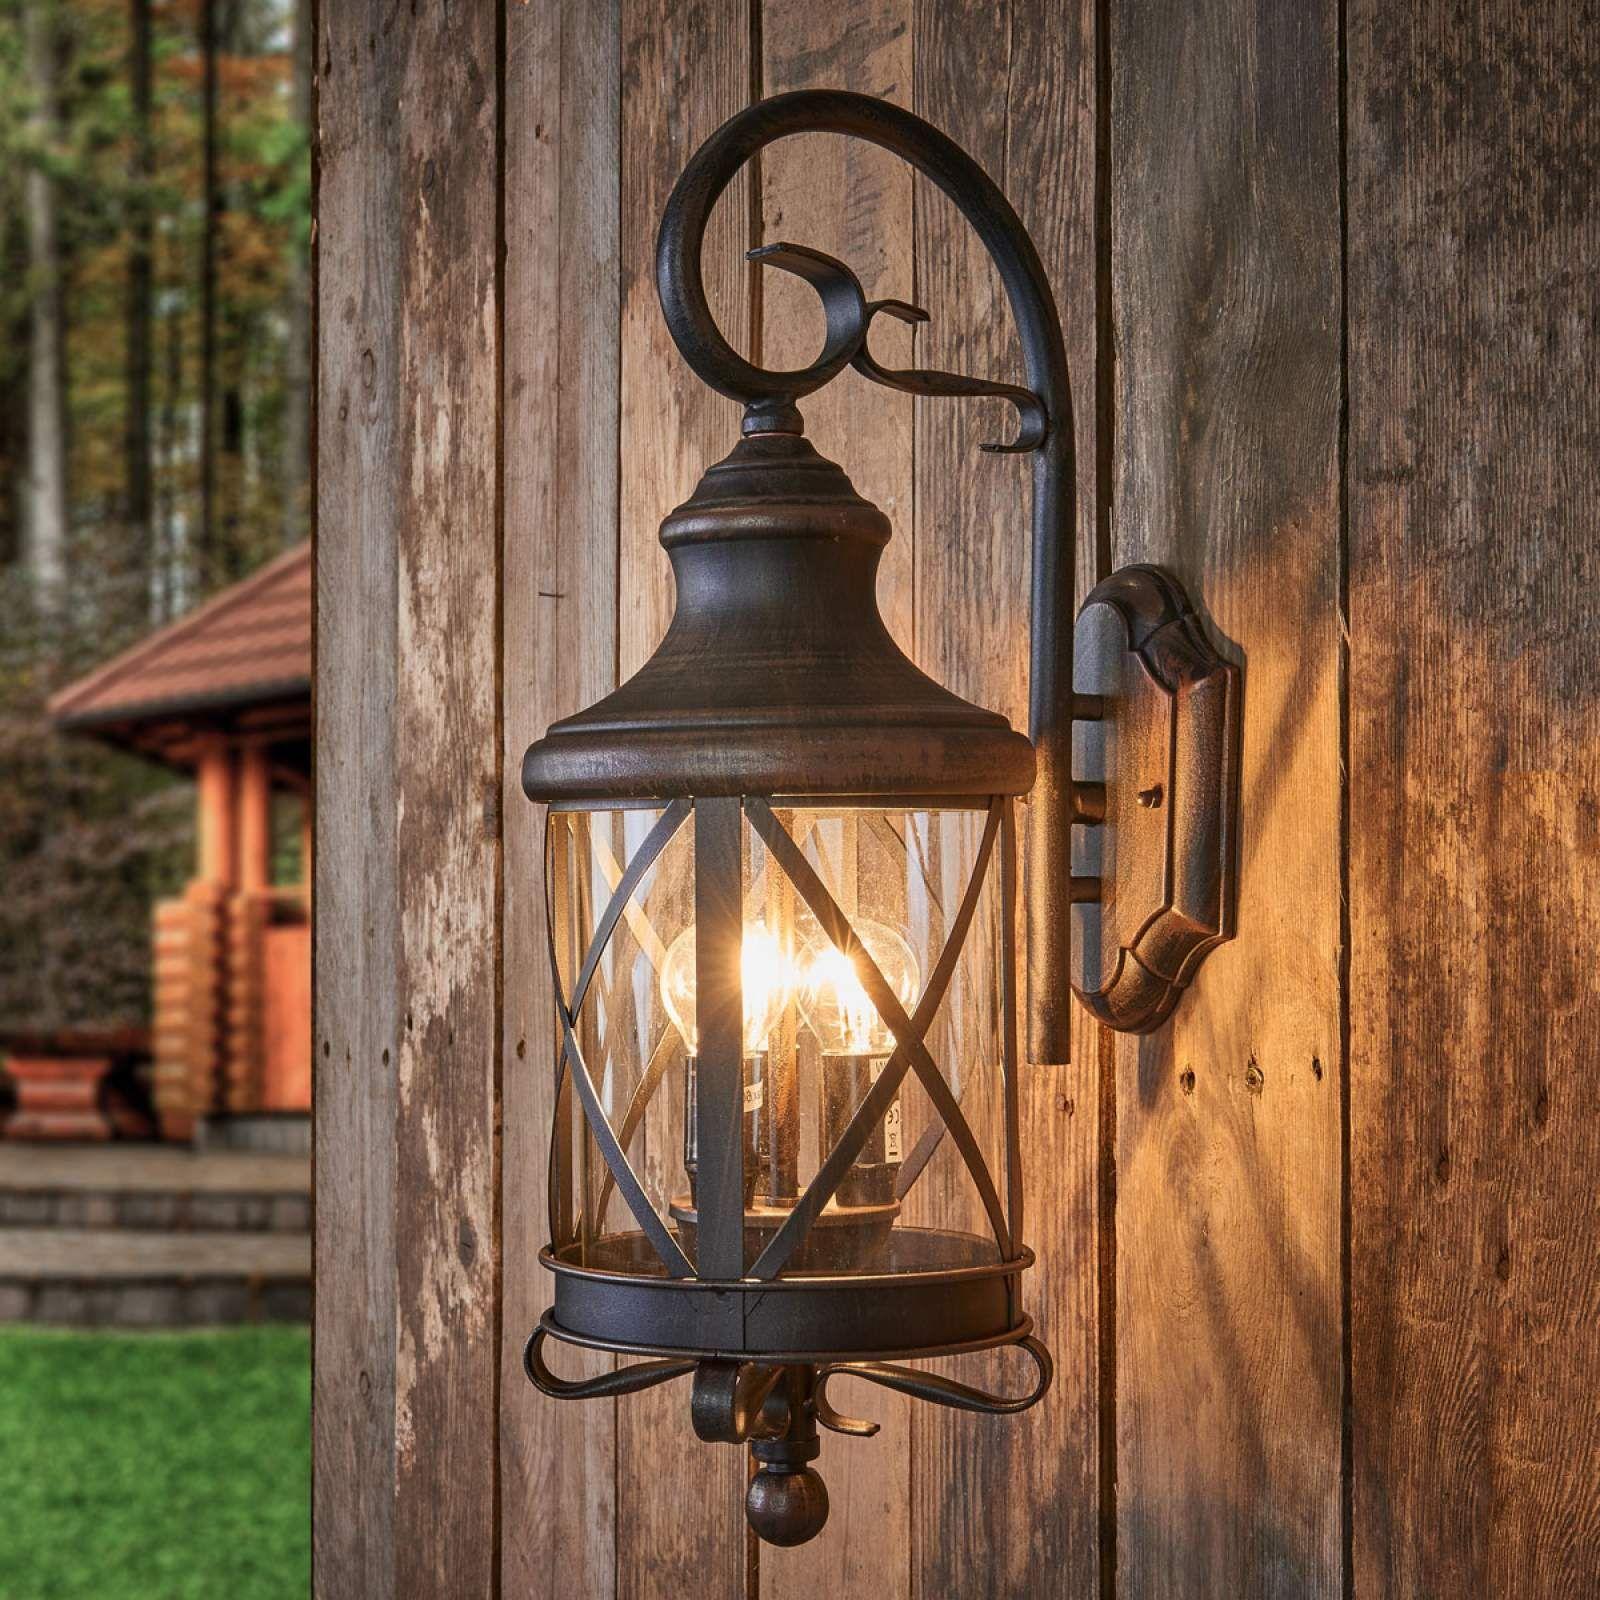 Rustikale LED Wand Beleuchtung Veranda Außen Lampe ALU Laterne Garten Leuchte